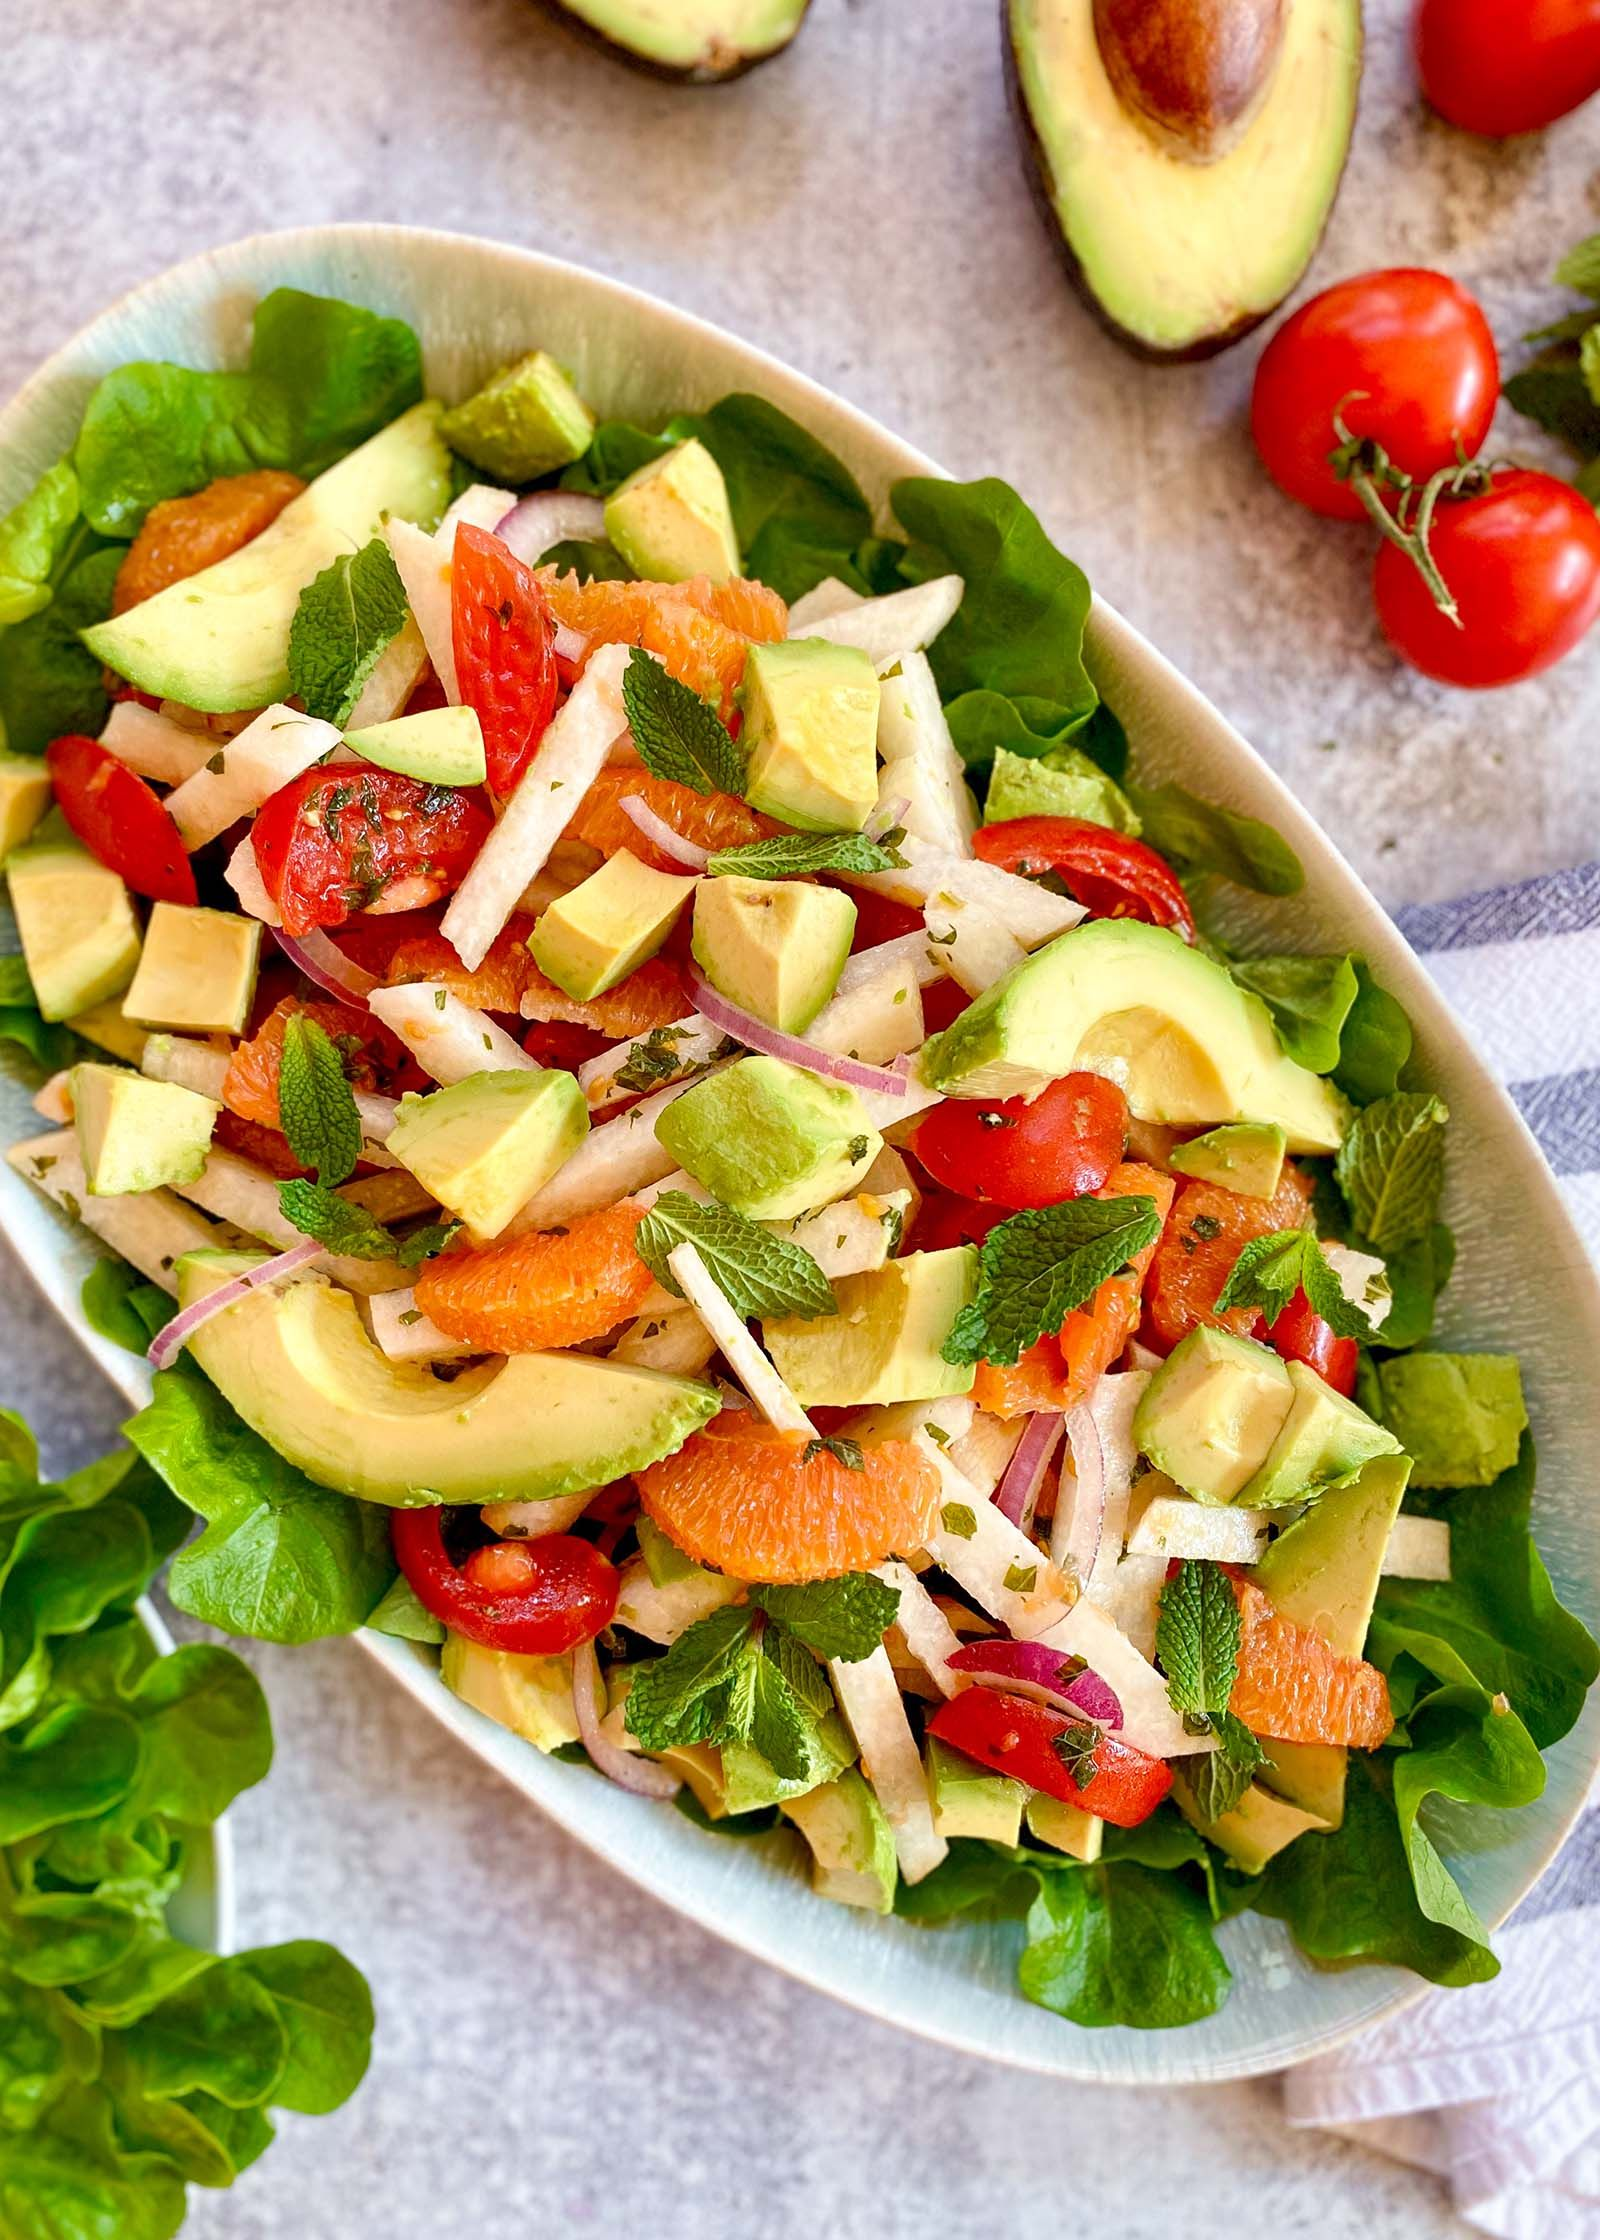 Jicama Avocado And Orange Salad Recipe Orange Salad Recipes Jicama Salad Recipes